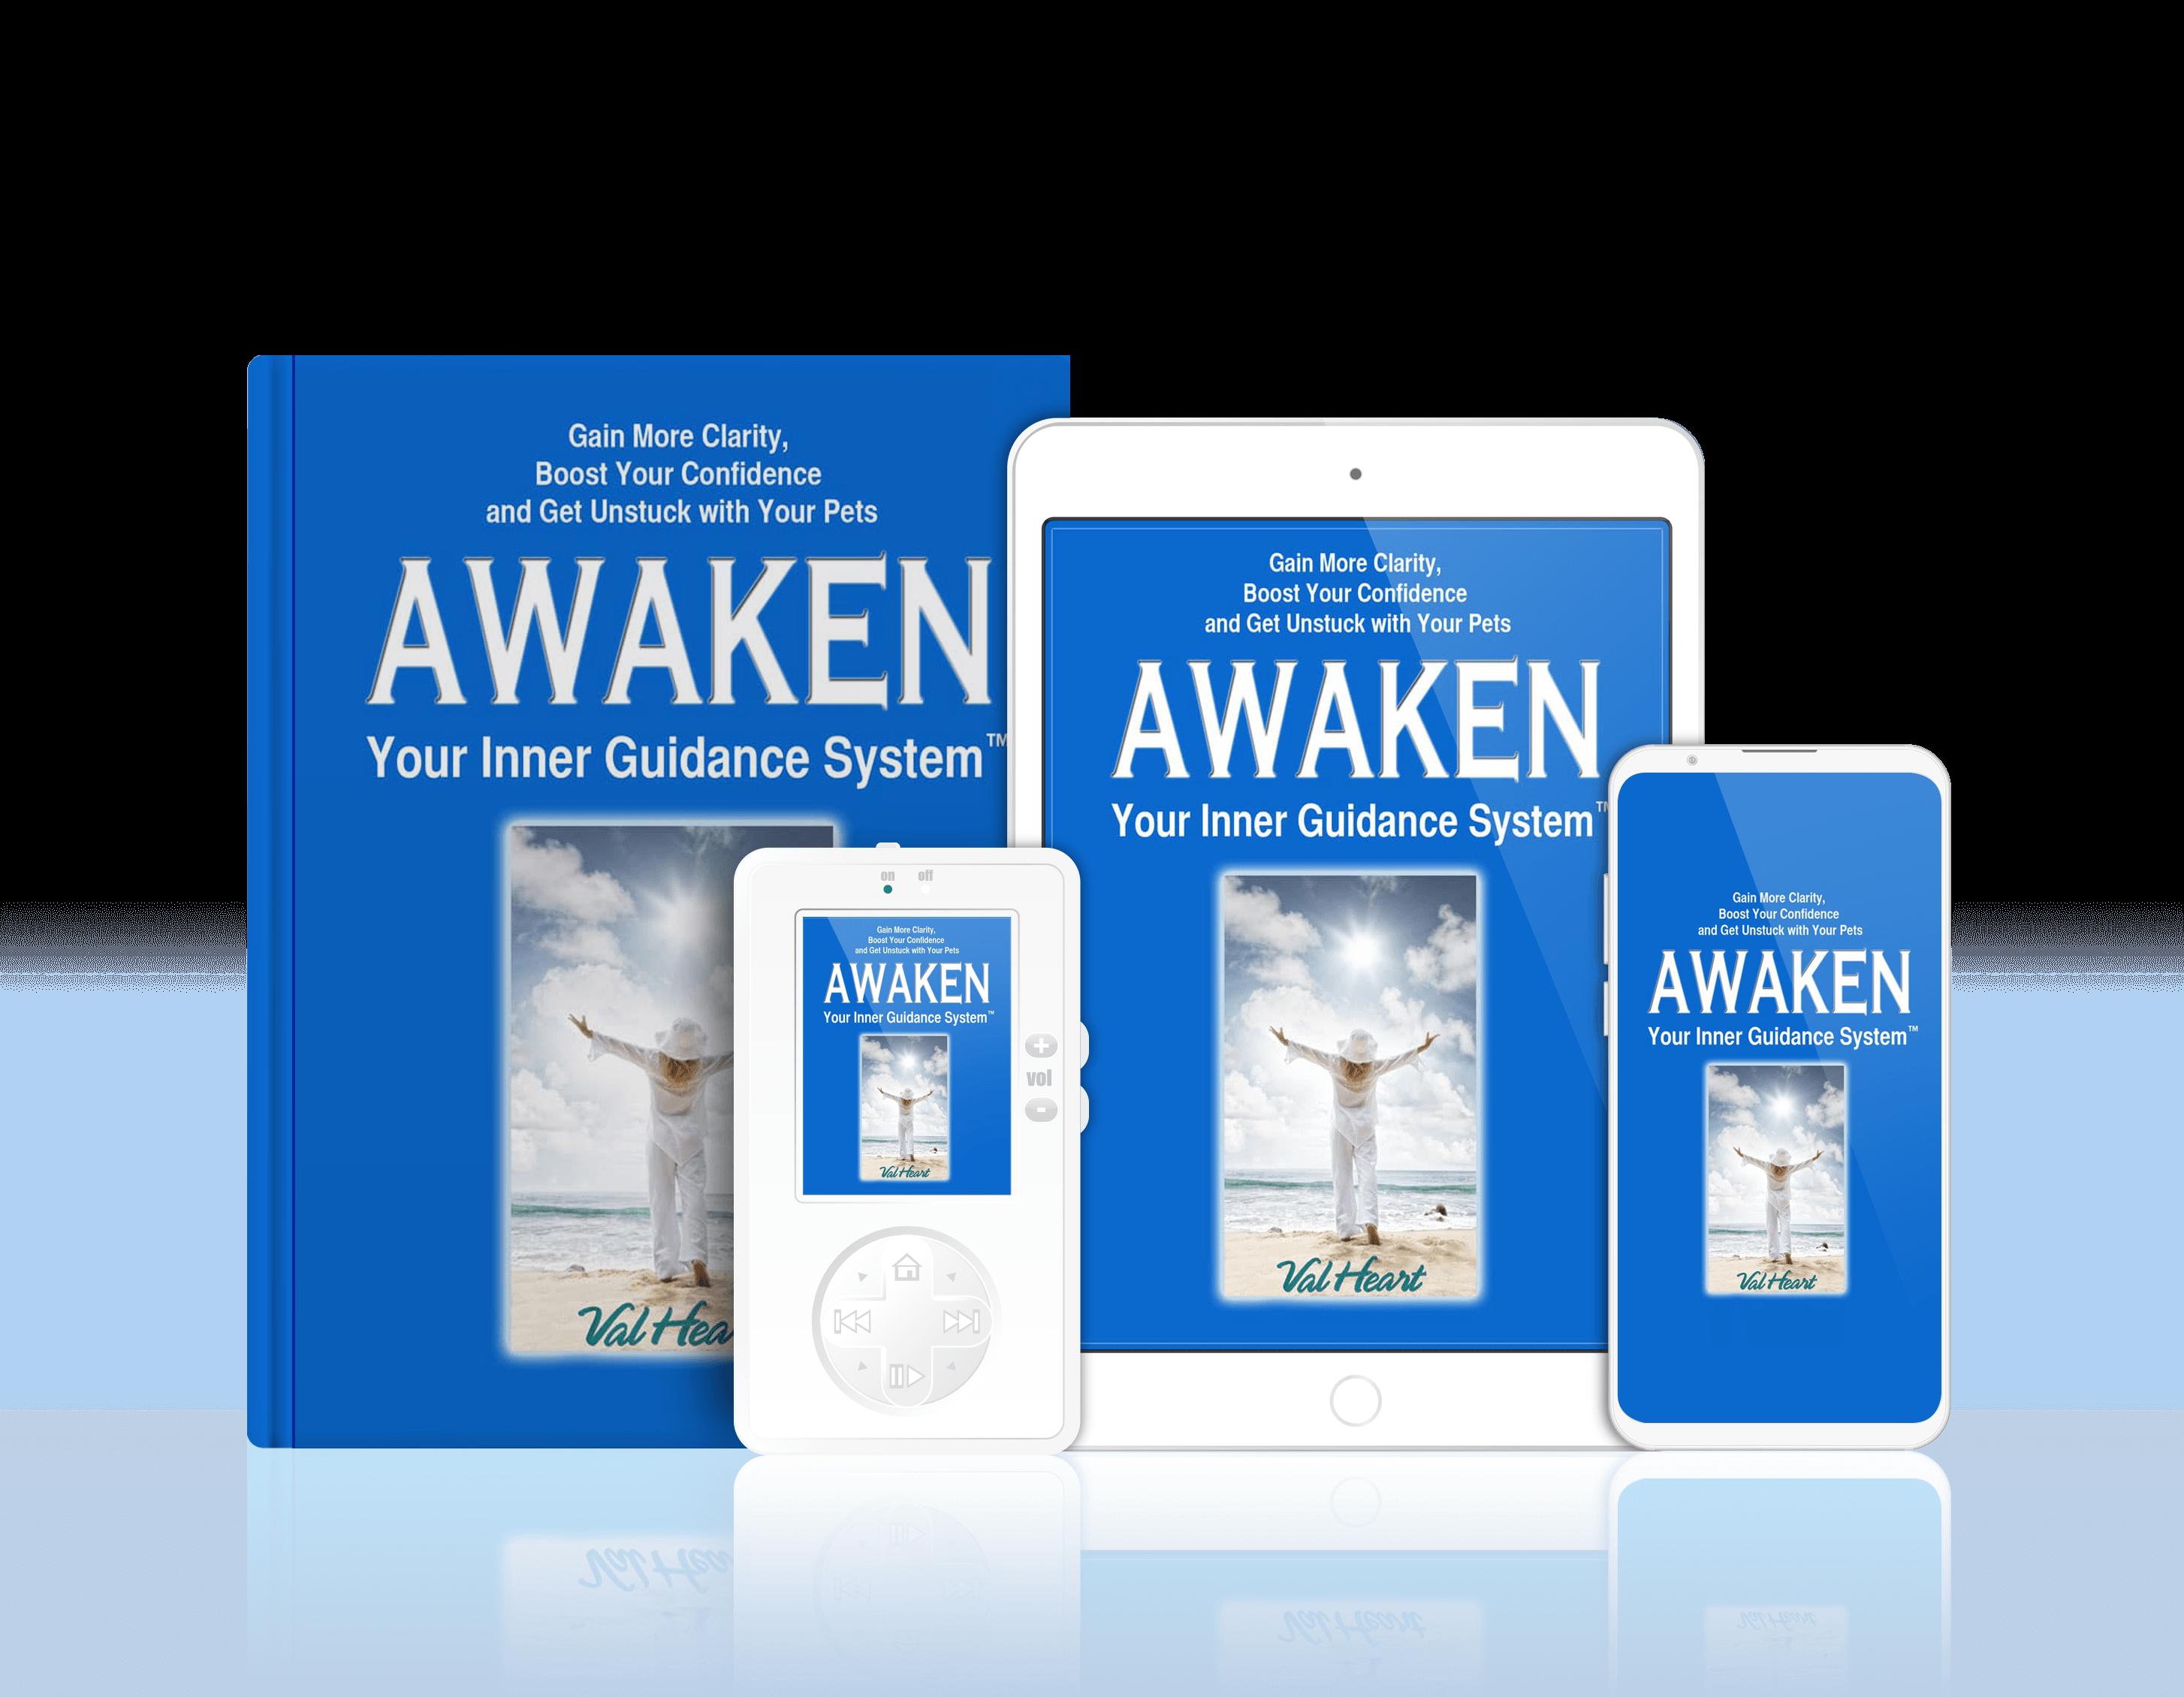 AwakenYourInnerGuidanceSystem without starburst transparent background (1)